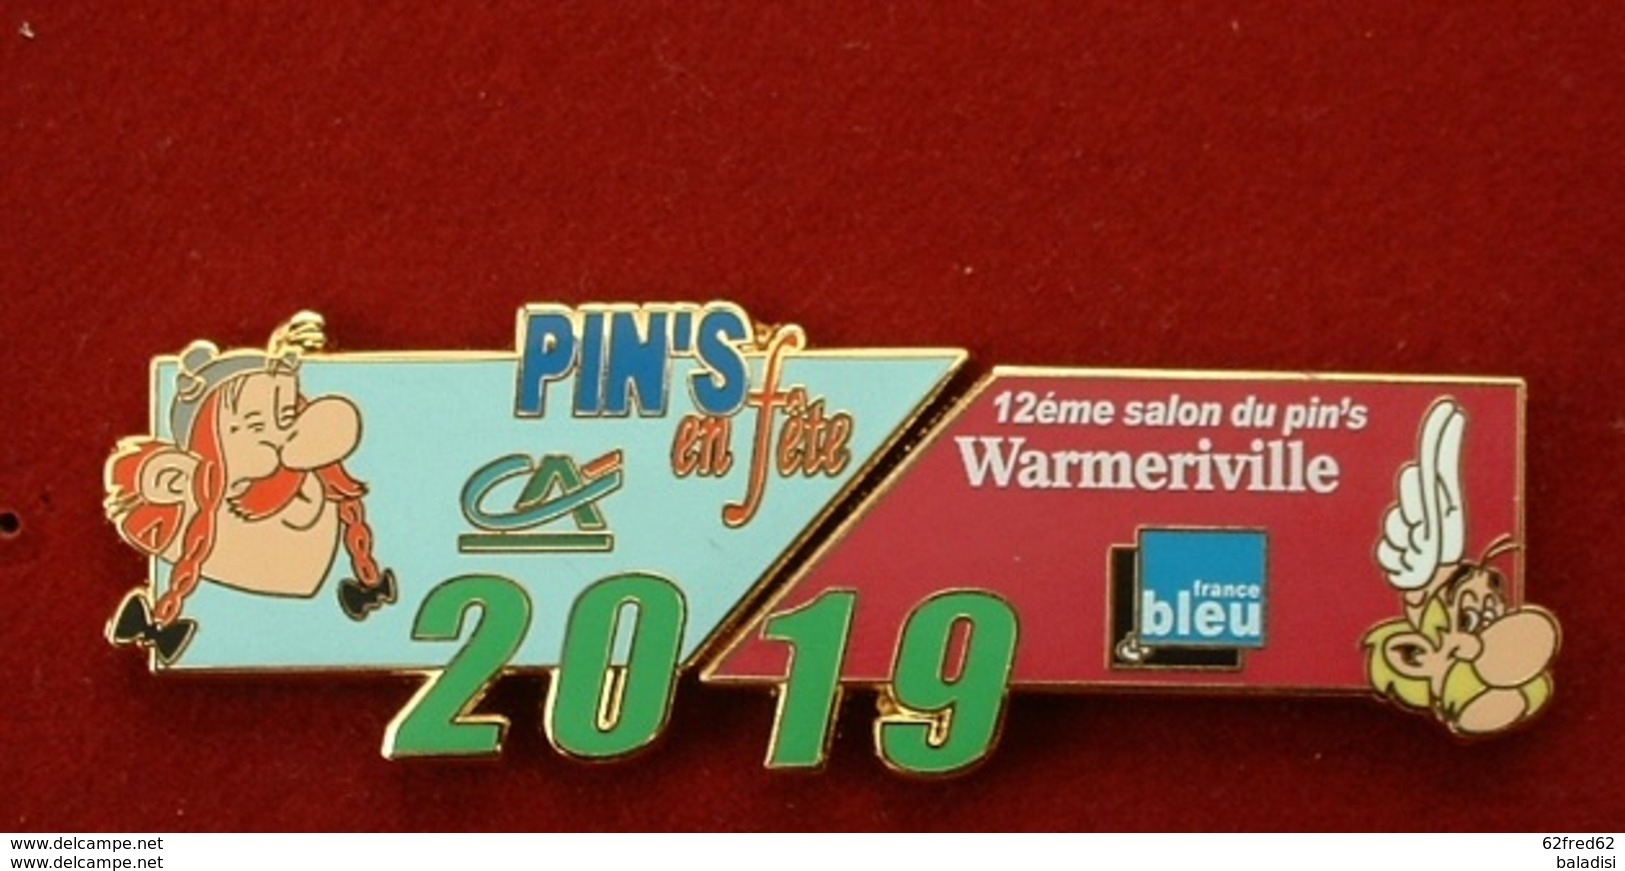 PUZZLE DE 2 PIN'S : 12éme SALON DU PIN'S WARMERIVILLE 2019 - ASTERIX & OBELIX - Comics